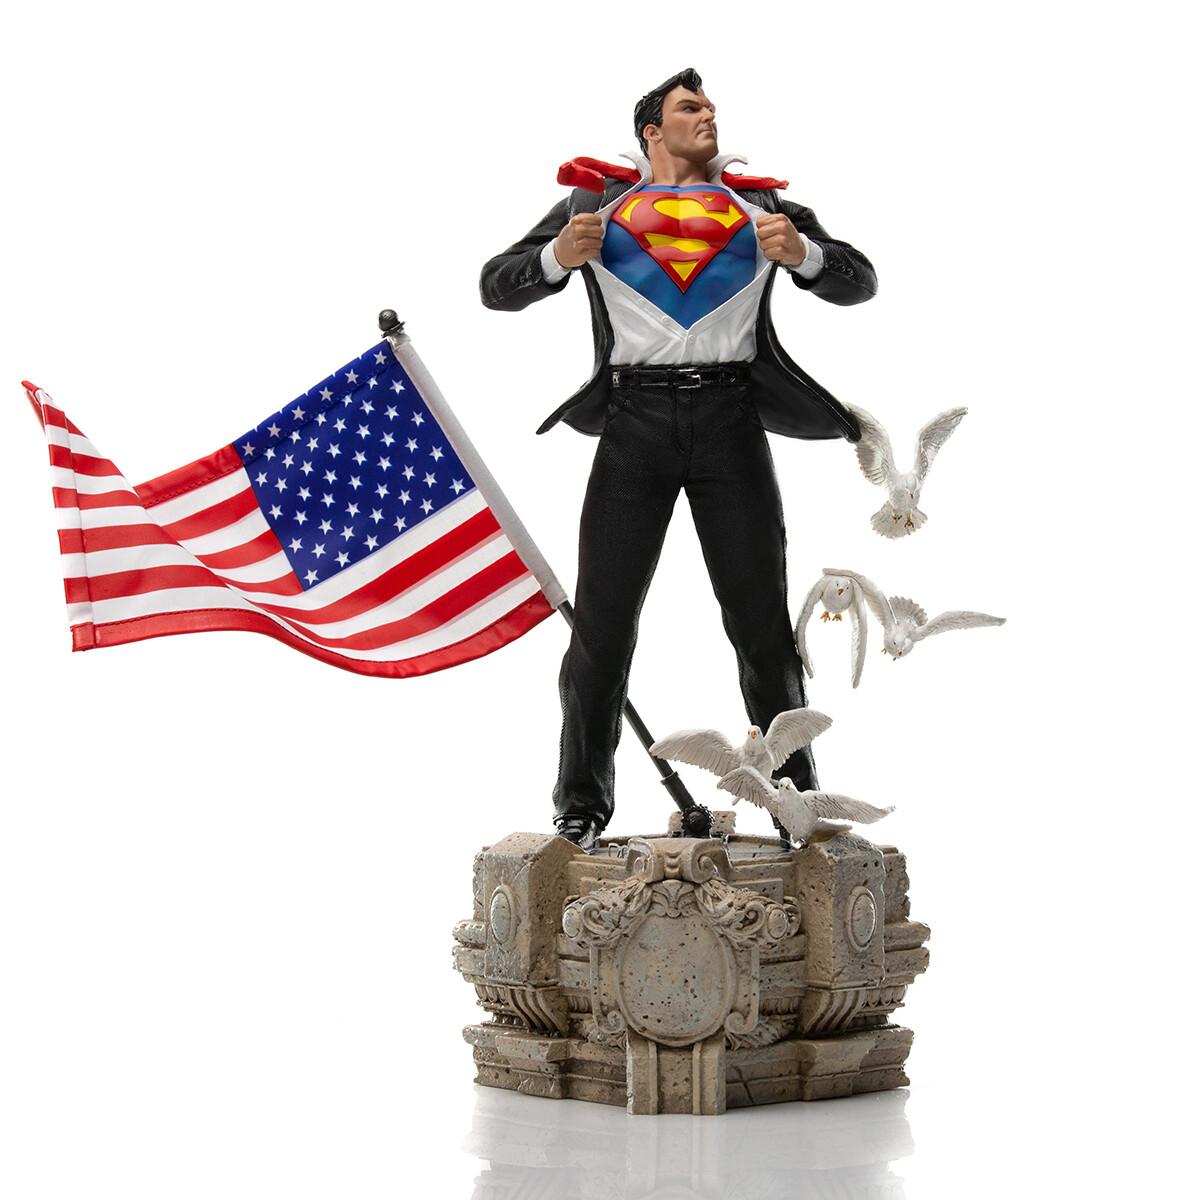 PRE-ORDER Iron Studios Clark Kent Deluxe Statue - DC Comics - Art Scale 1/10